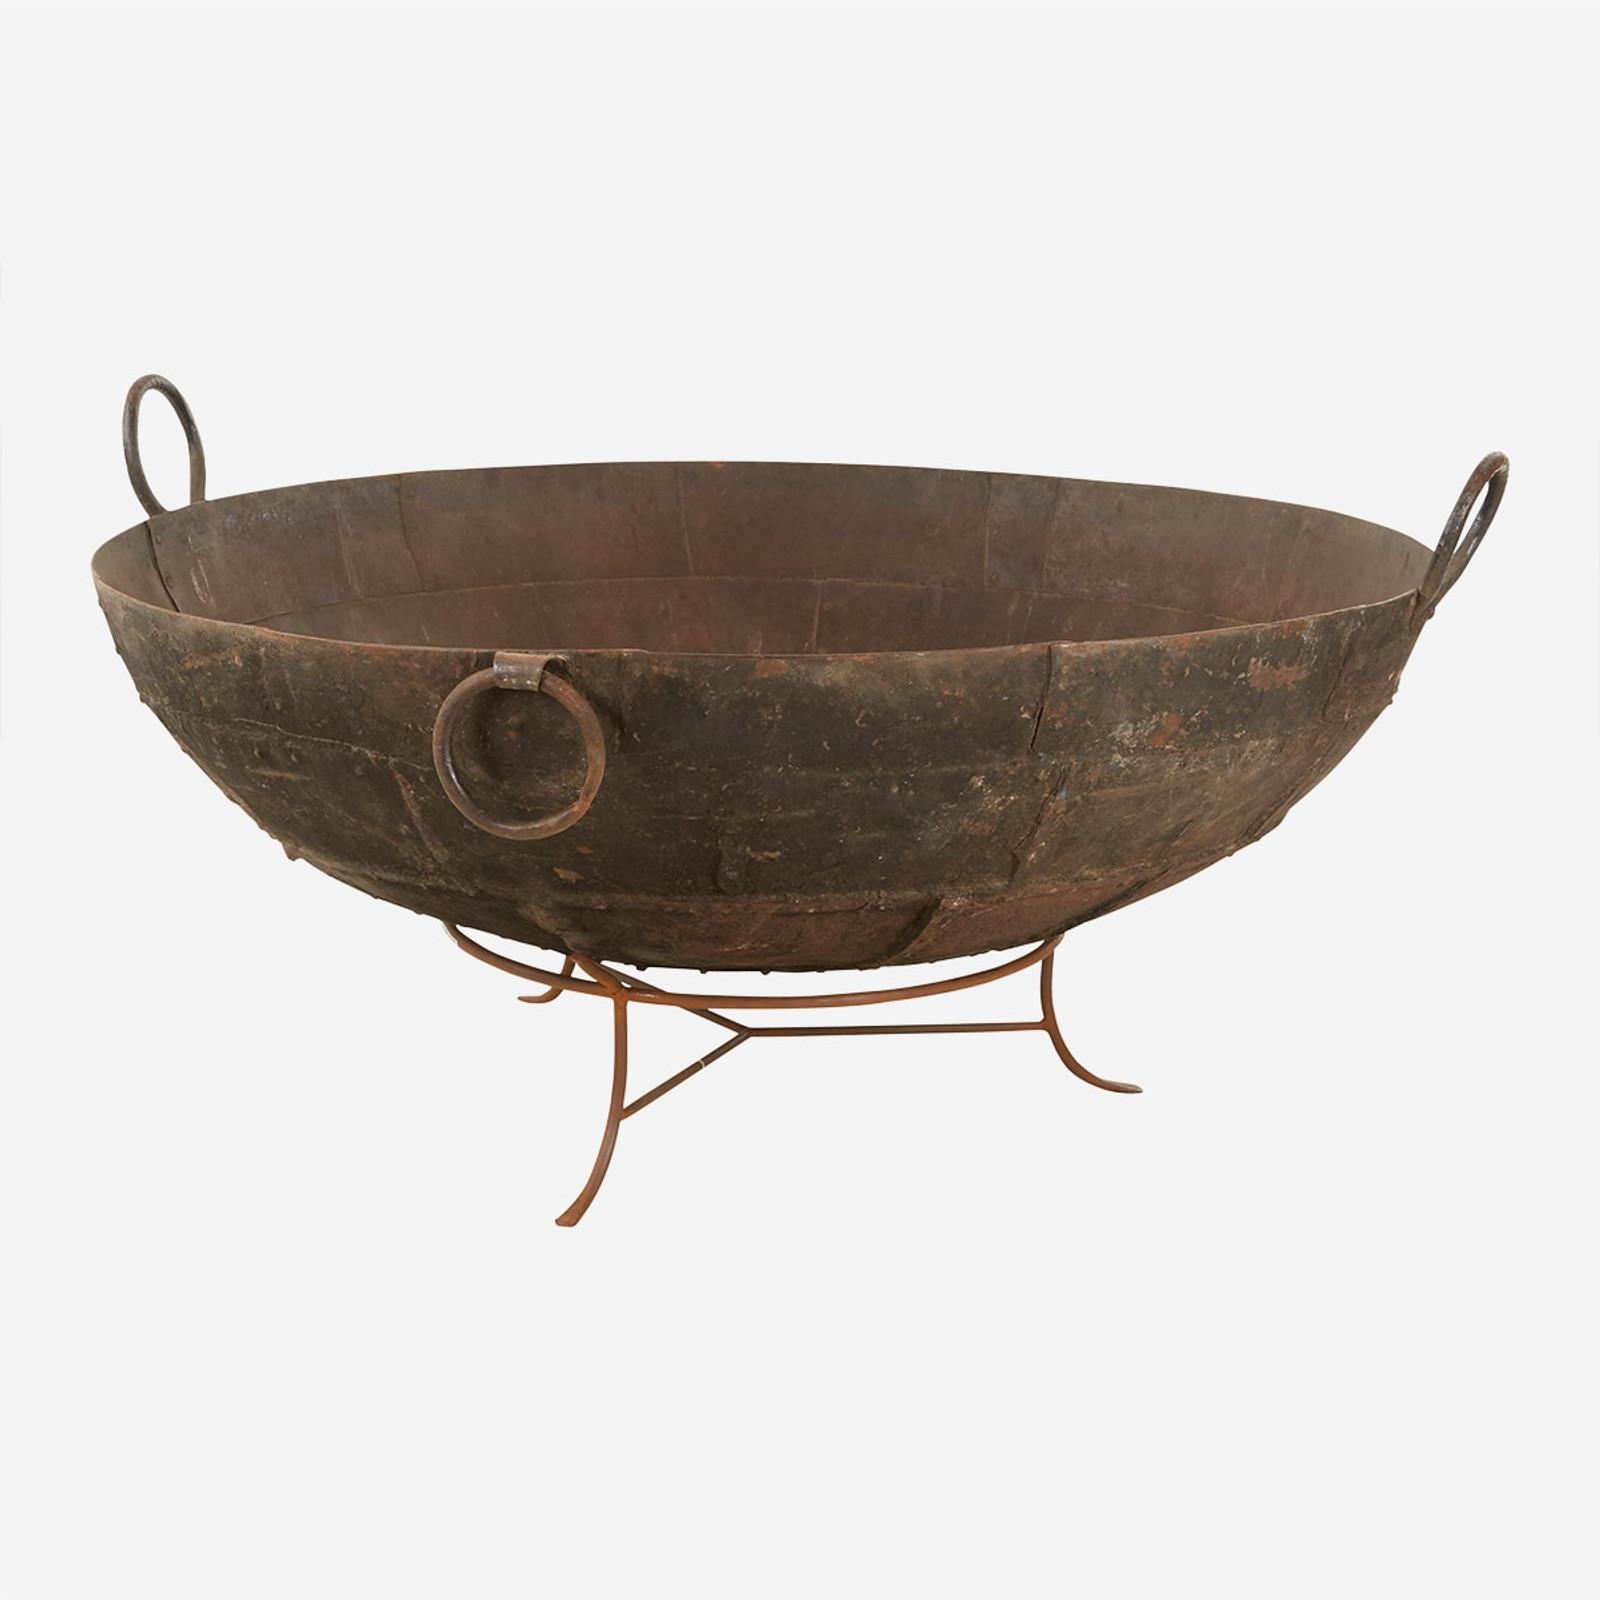 Vintage Fire Pit (36-50in Diameter)